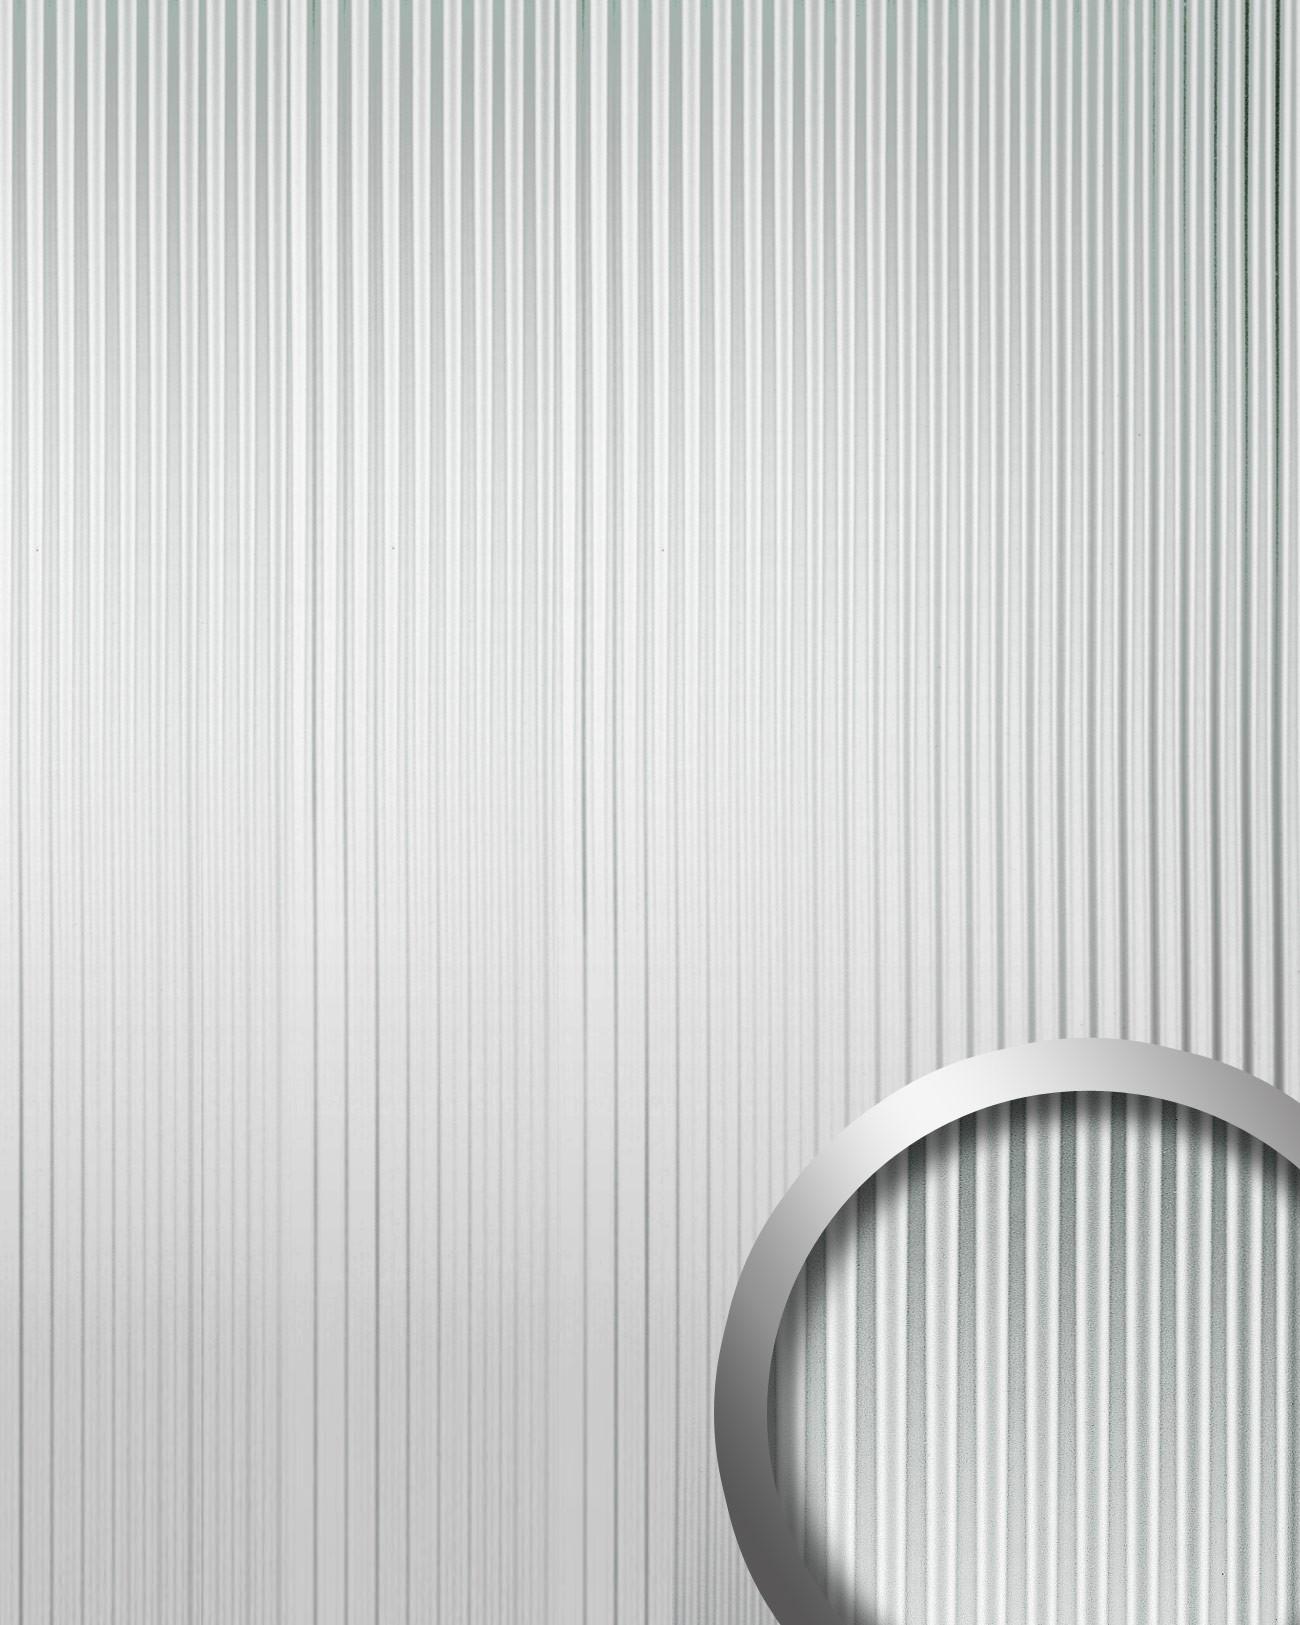 wallface 11360 wave pannello effetto 3d lamiera metallica argento 2 60 mq ebay. Black Bedroom Furniture Sets. Home Design Ideas